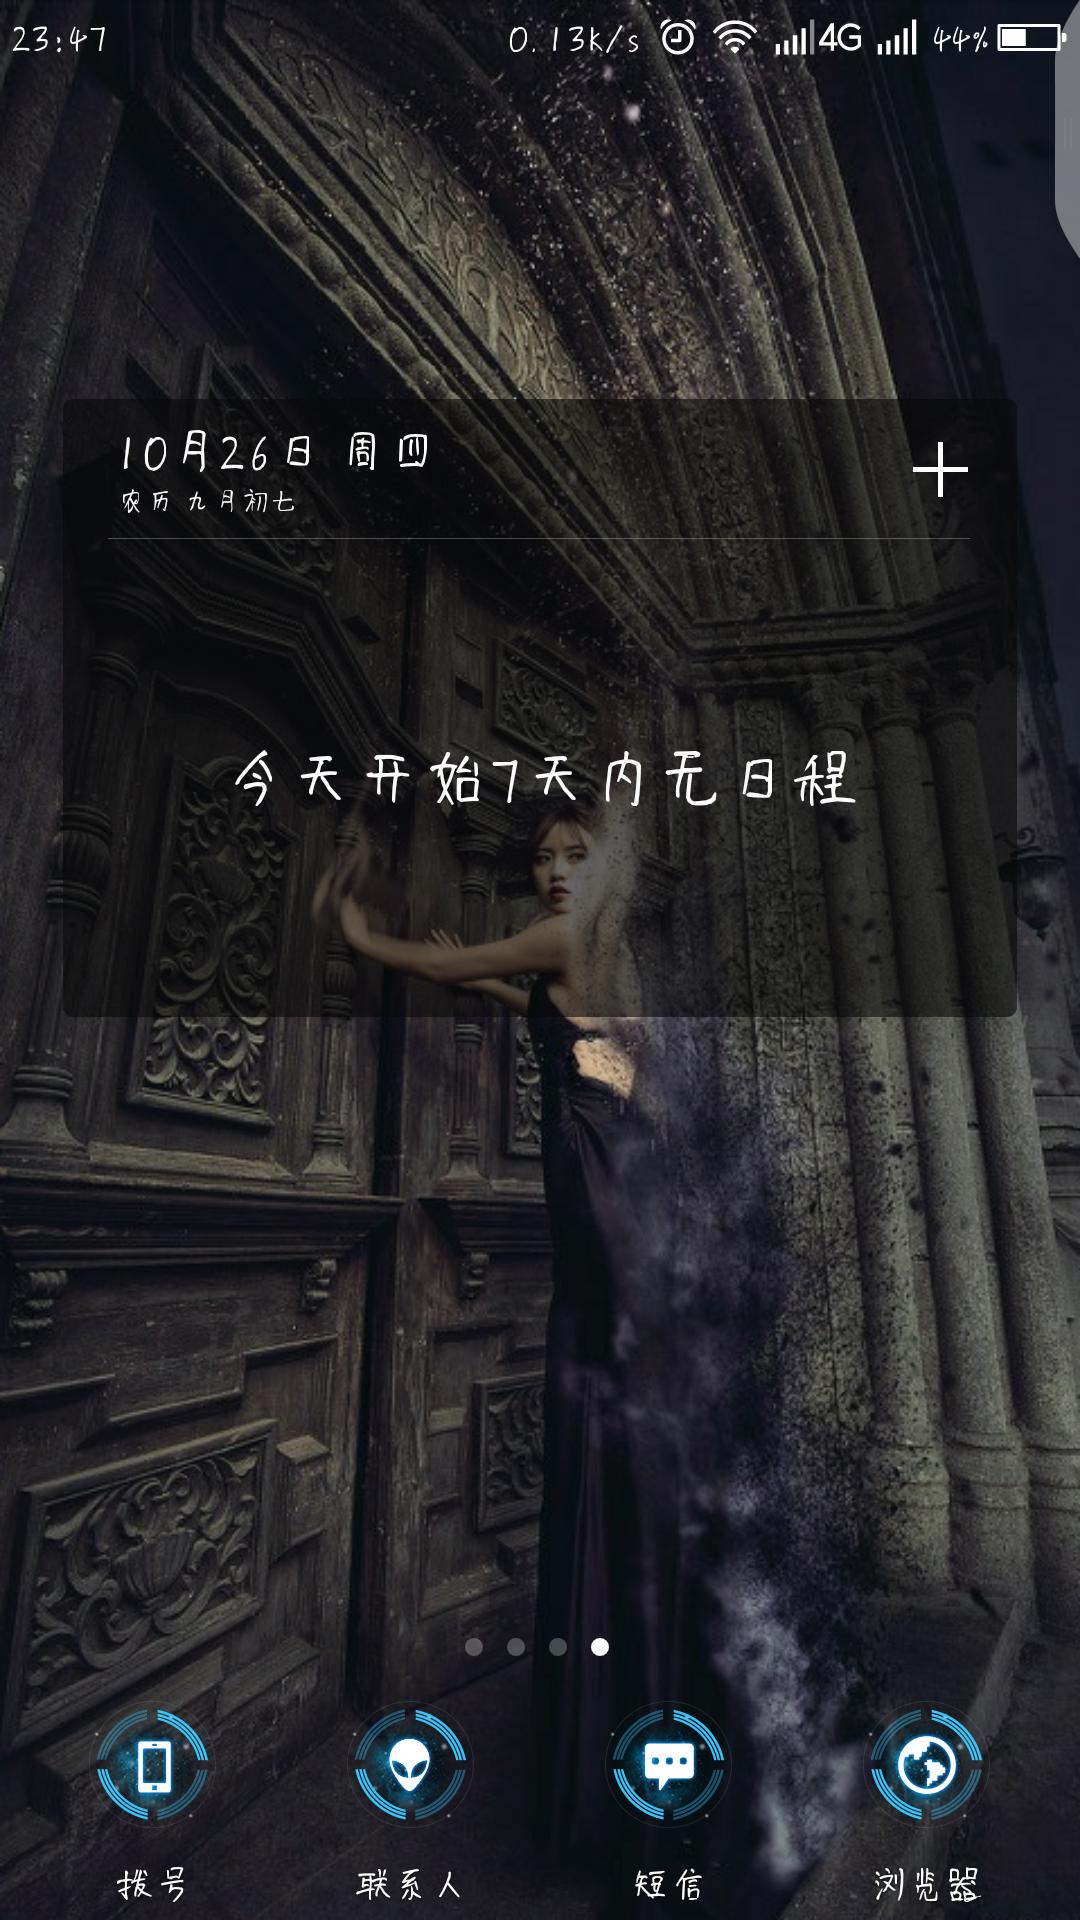 Screenshot_2017-10-26-23-47-43.png